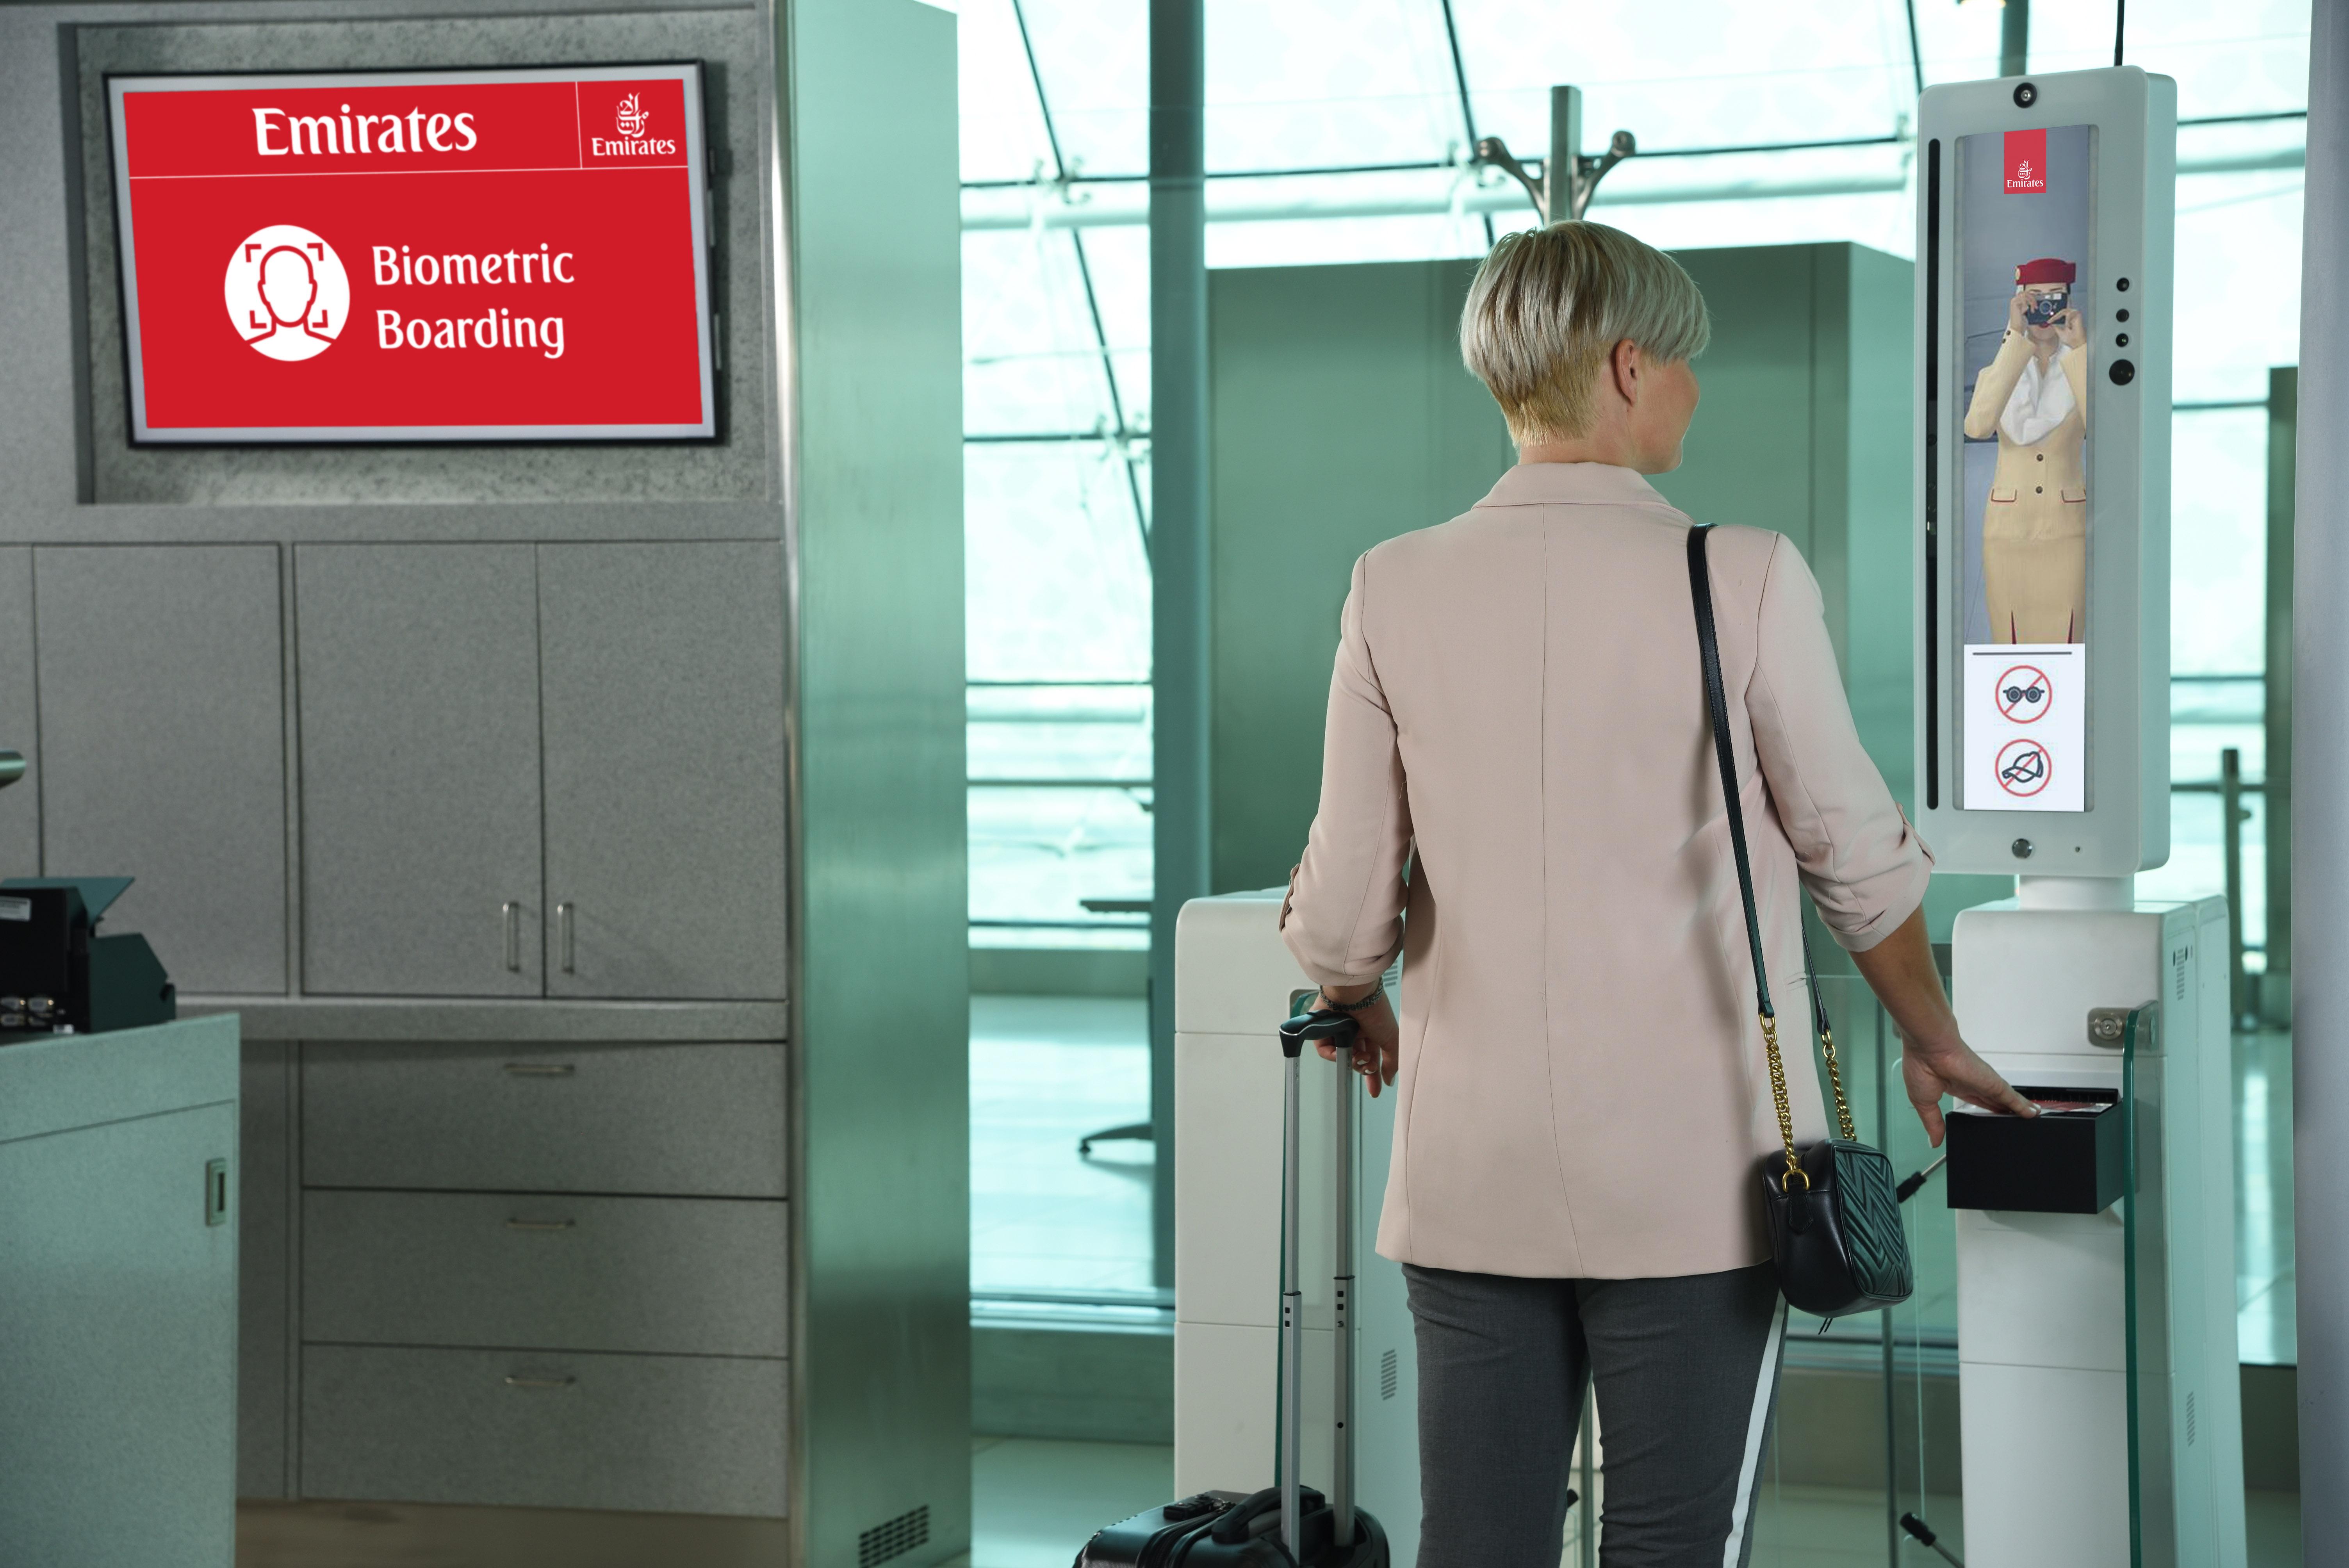 PR-foto fra Emirates.